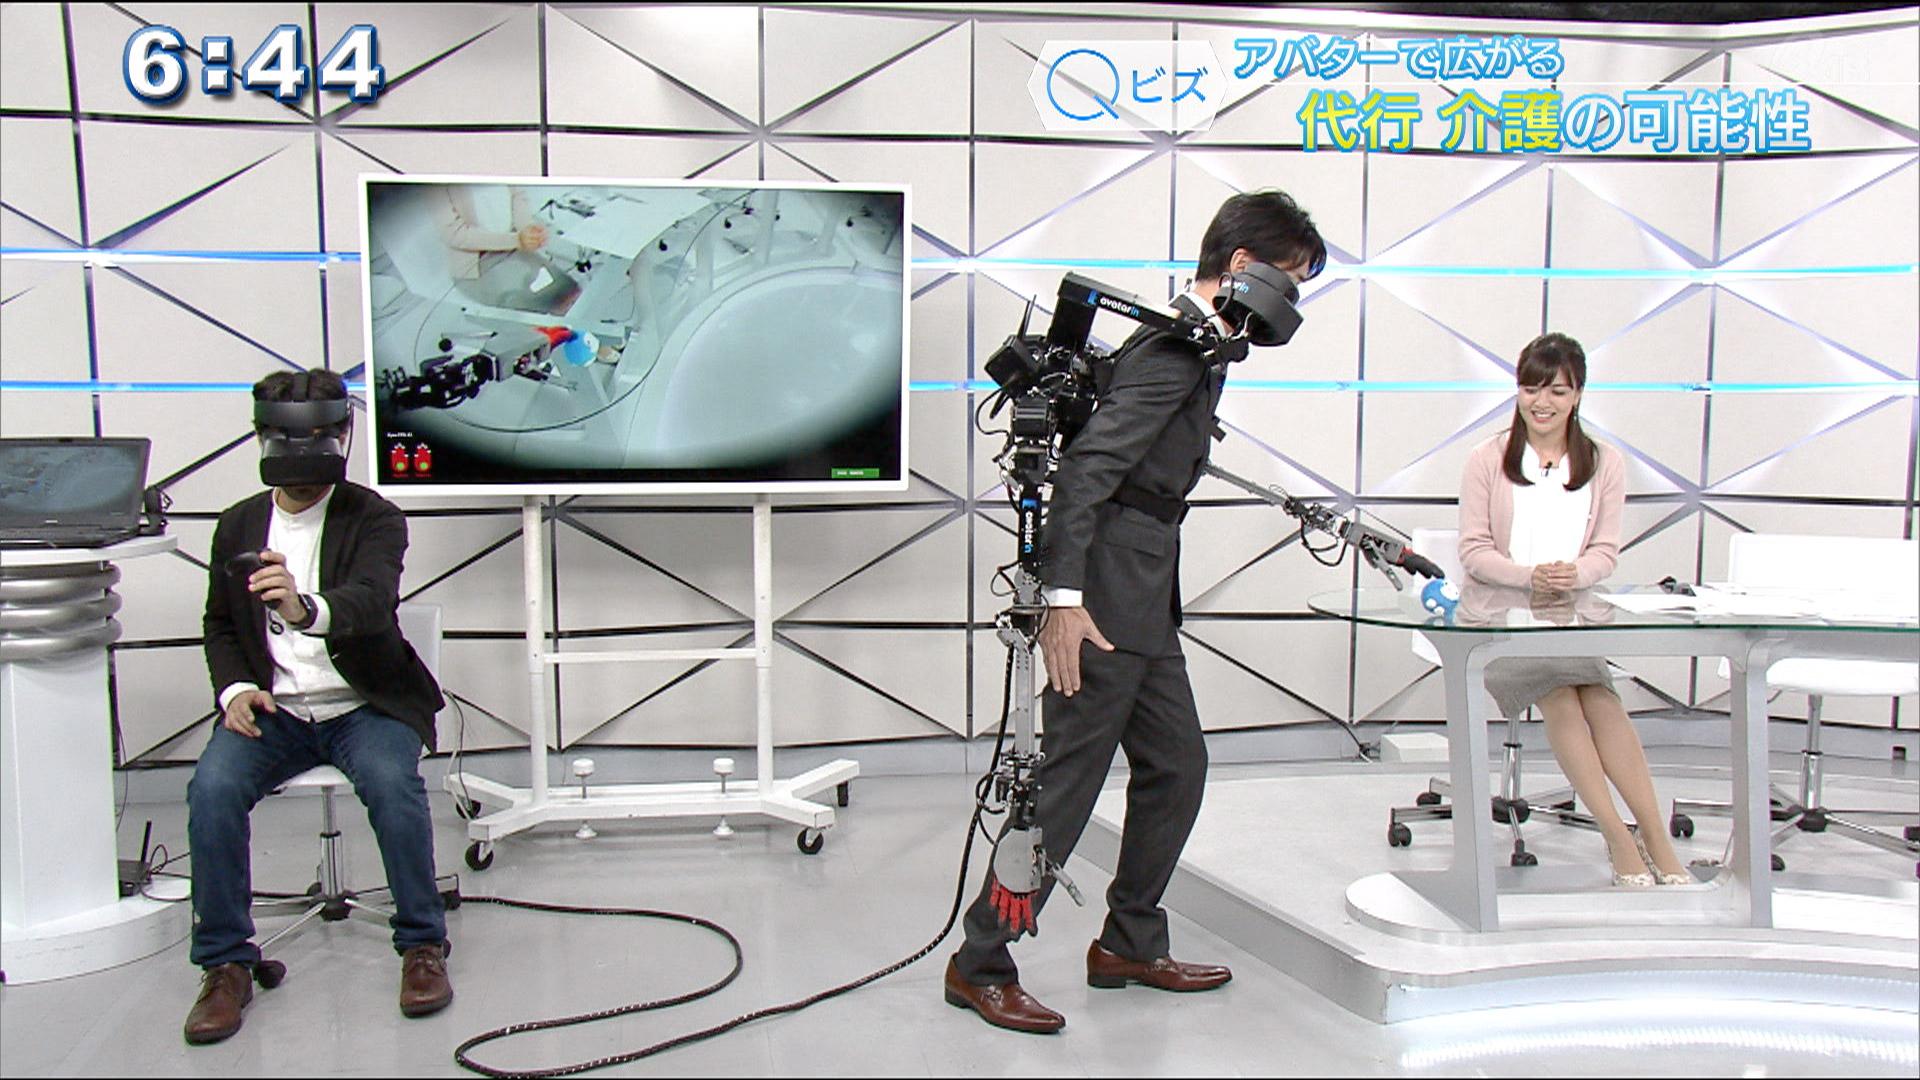 Qビズ 分身ロボット アバター登場